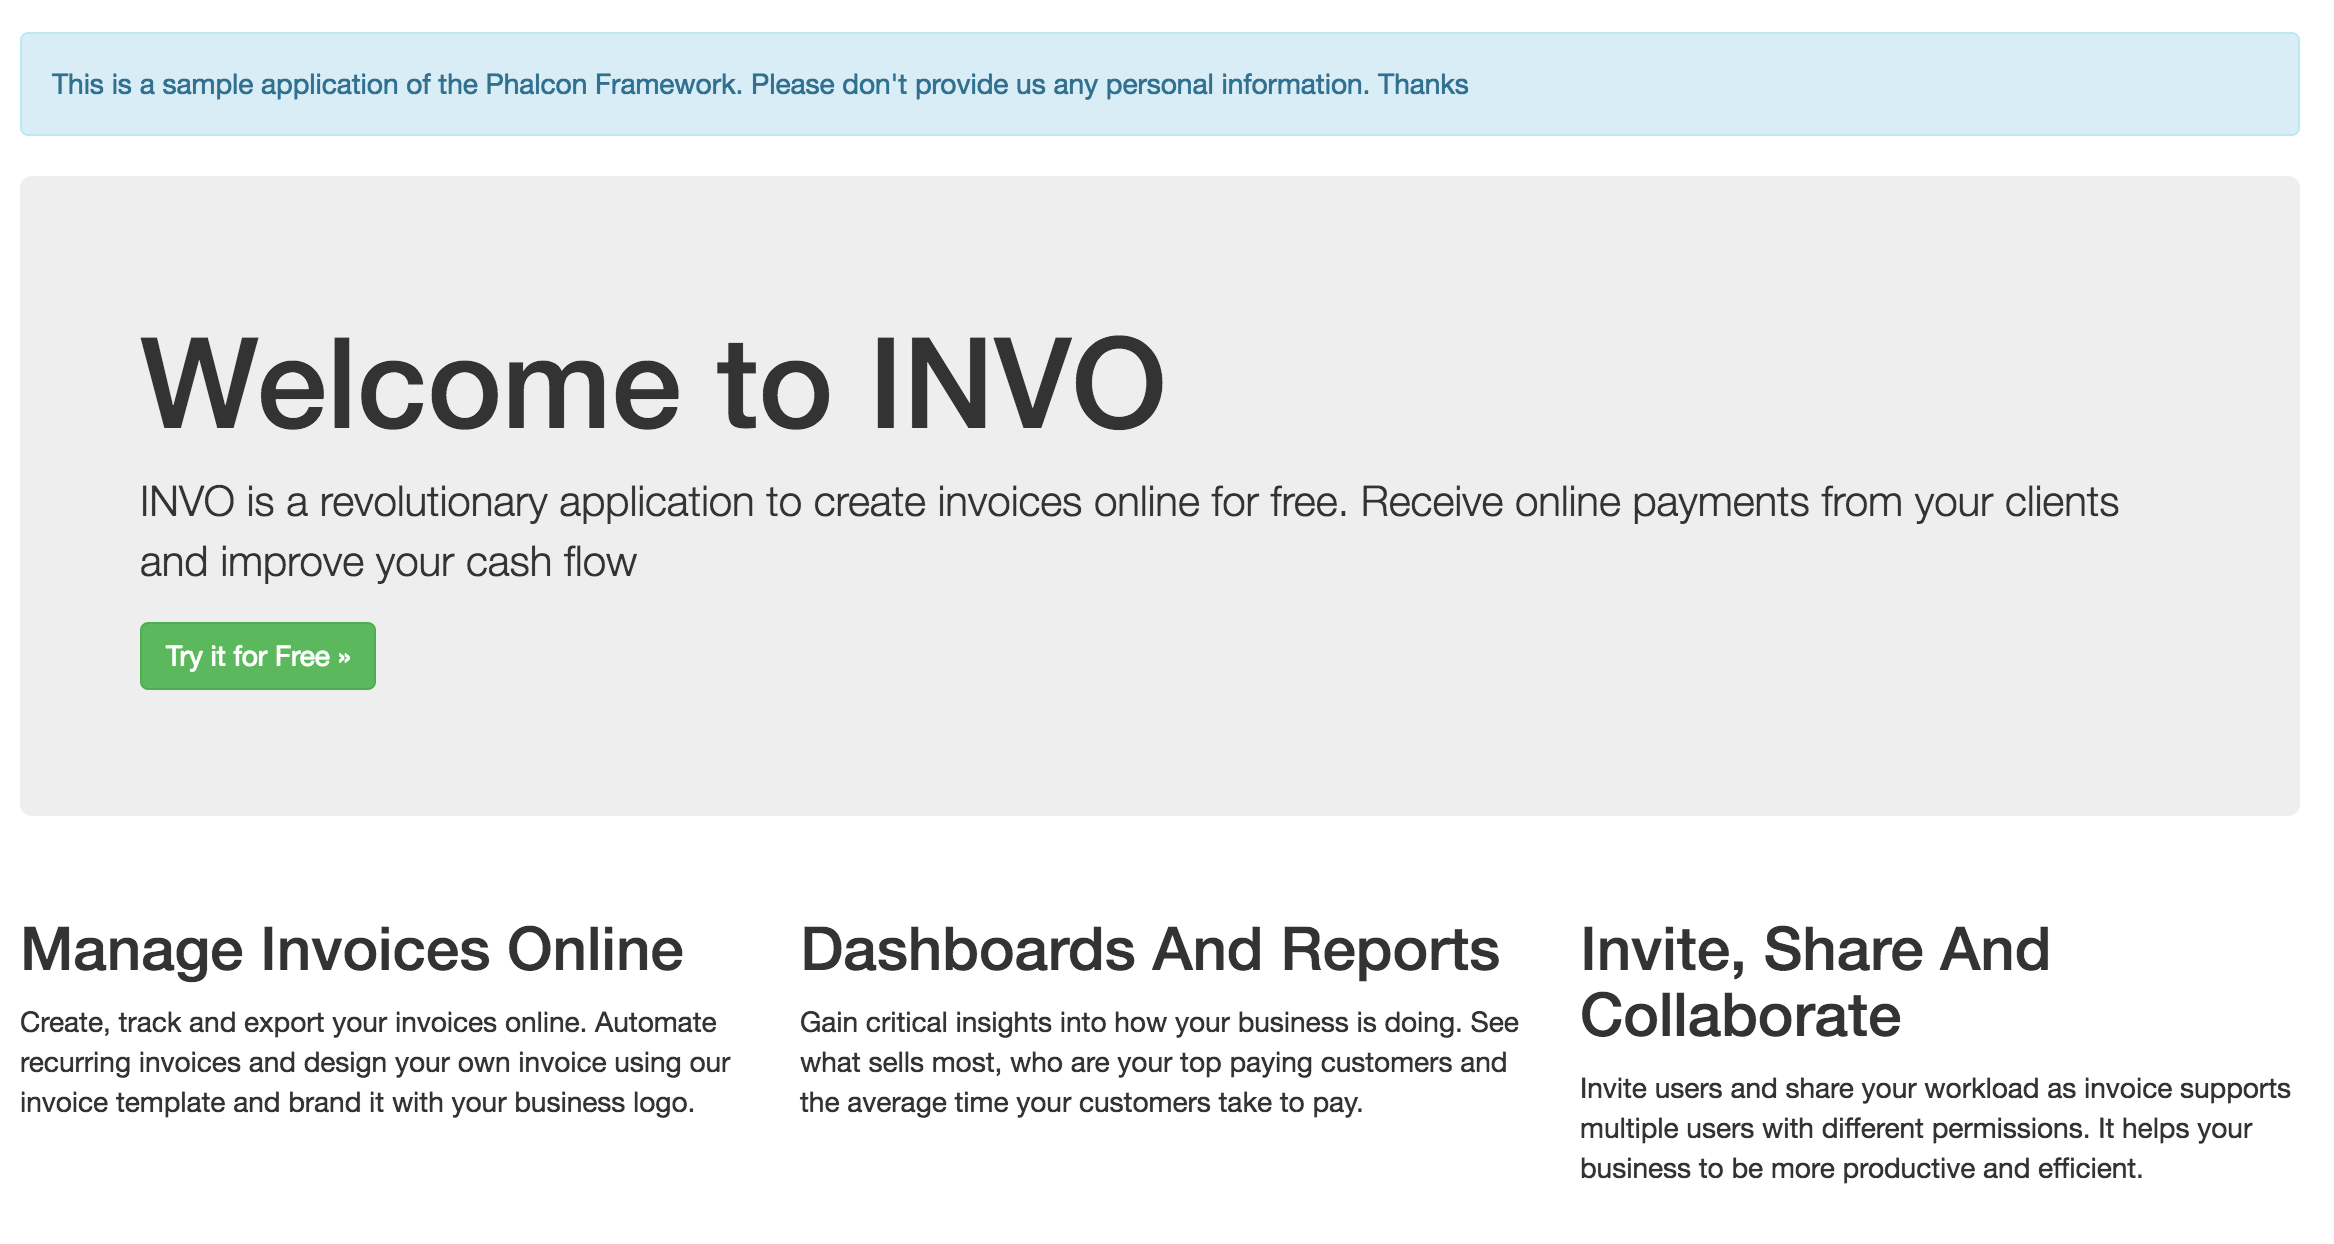 Invo screenshot